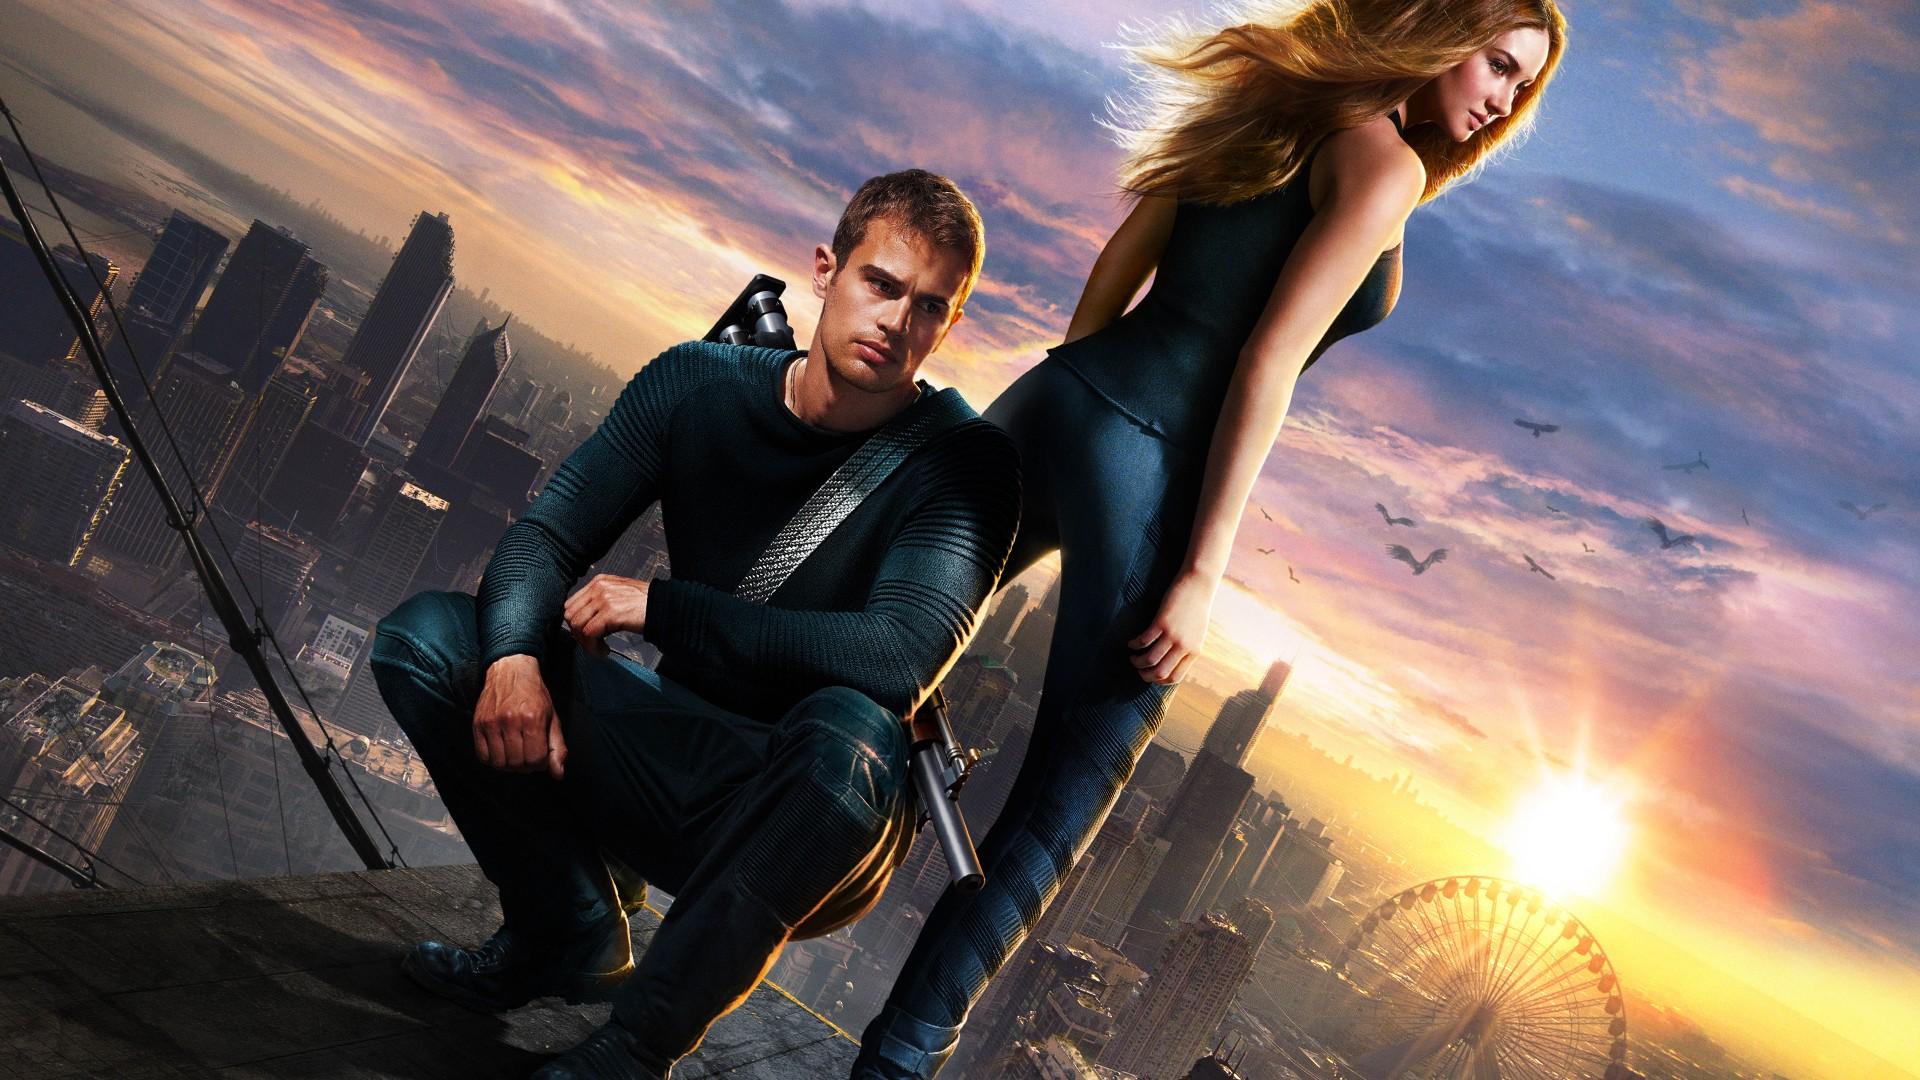 Divergent Movie Desktop Themes Wallpapers 12373 Wallpaper 1920x1080